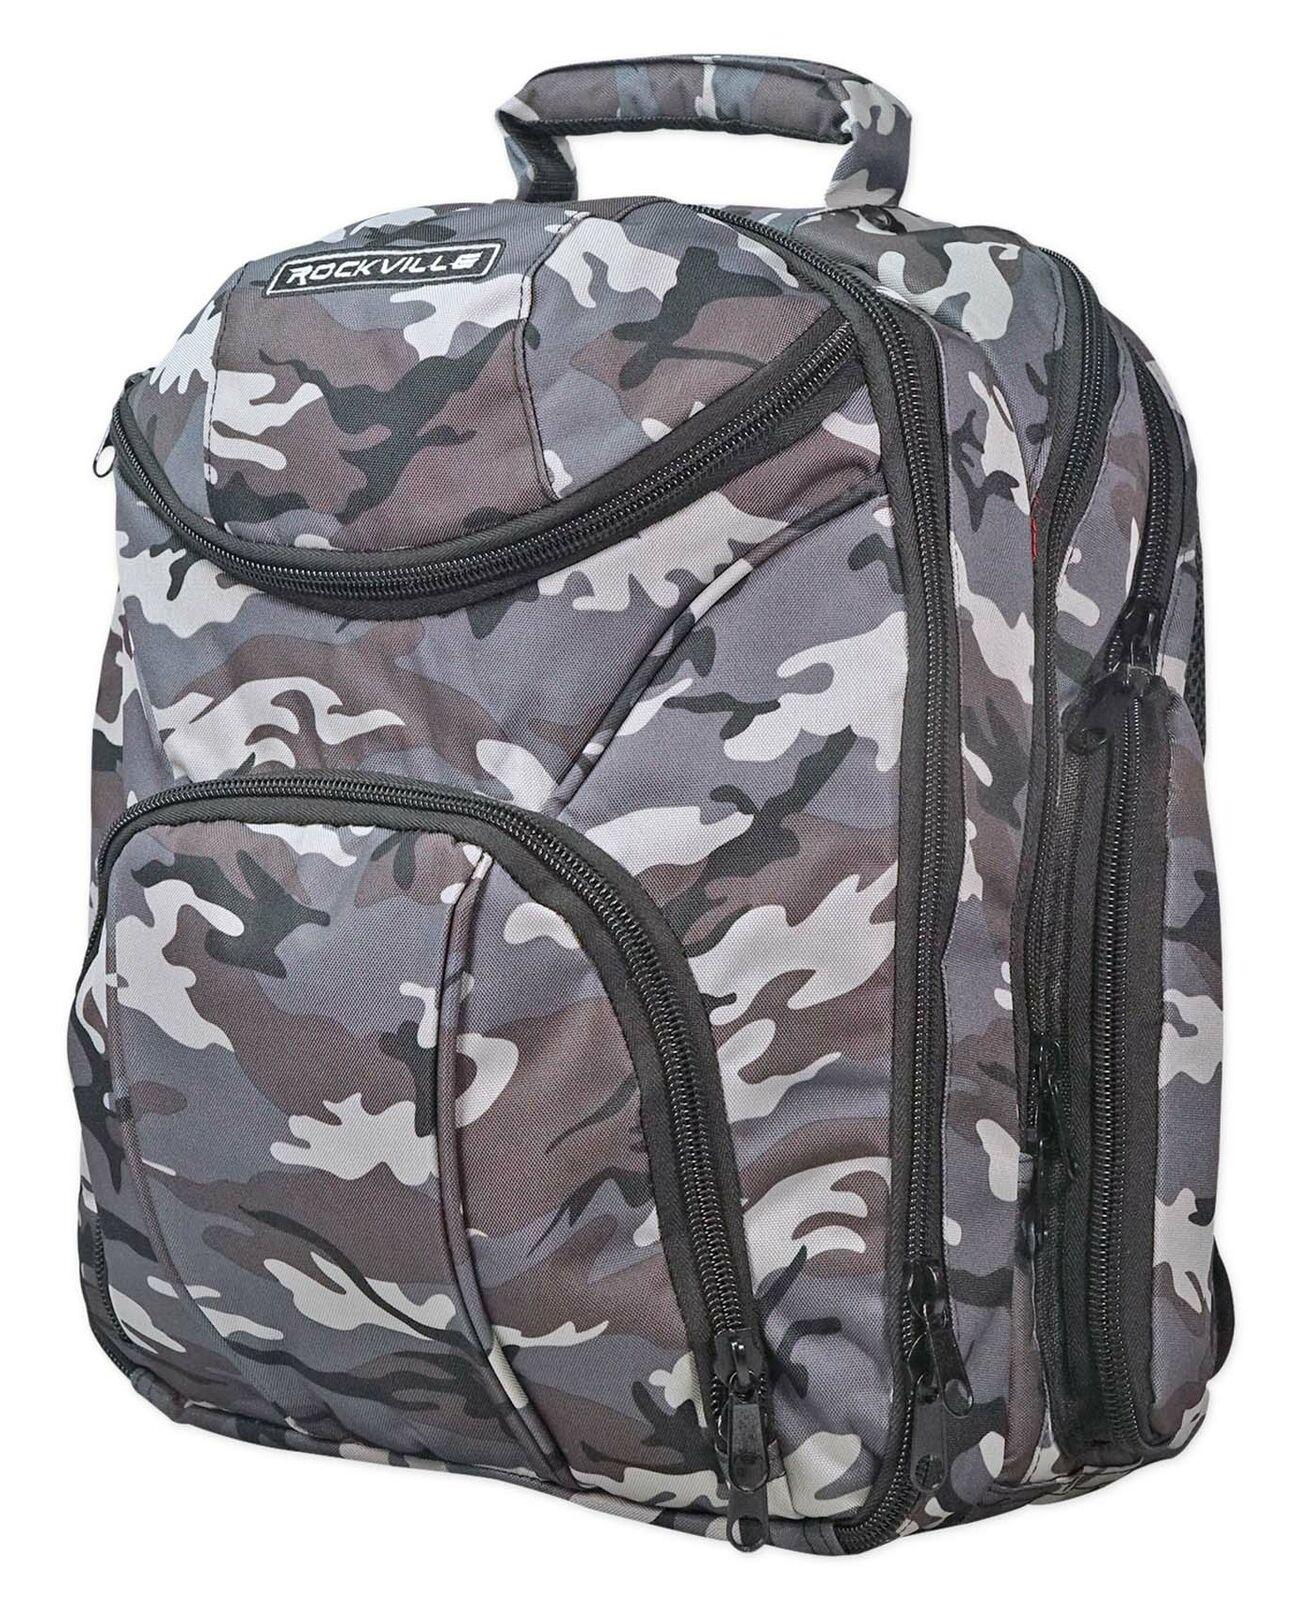 Rockville Travel Case Camo Backpack Bag For Allen & Heath XONE 23 Mixer